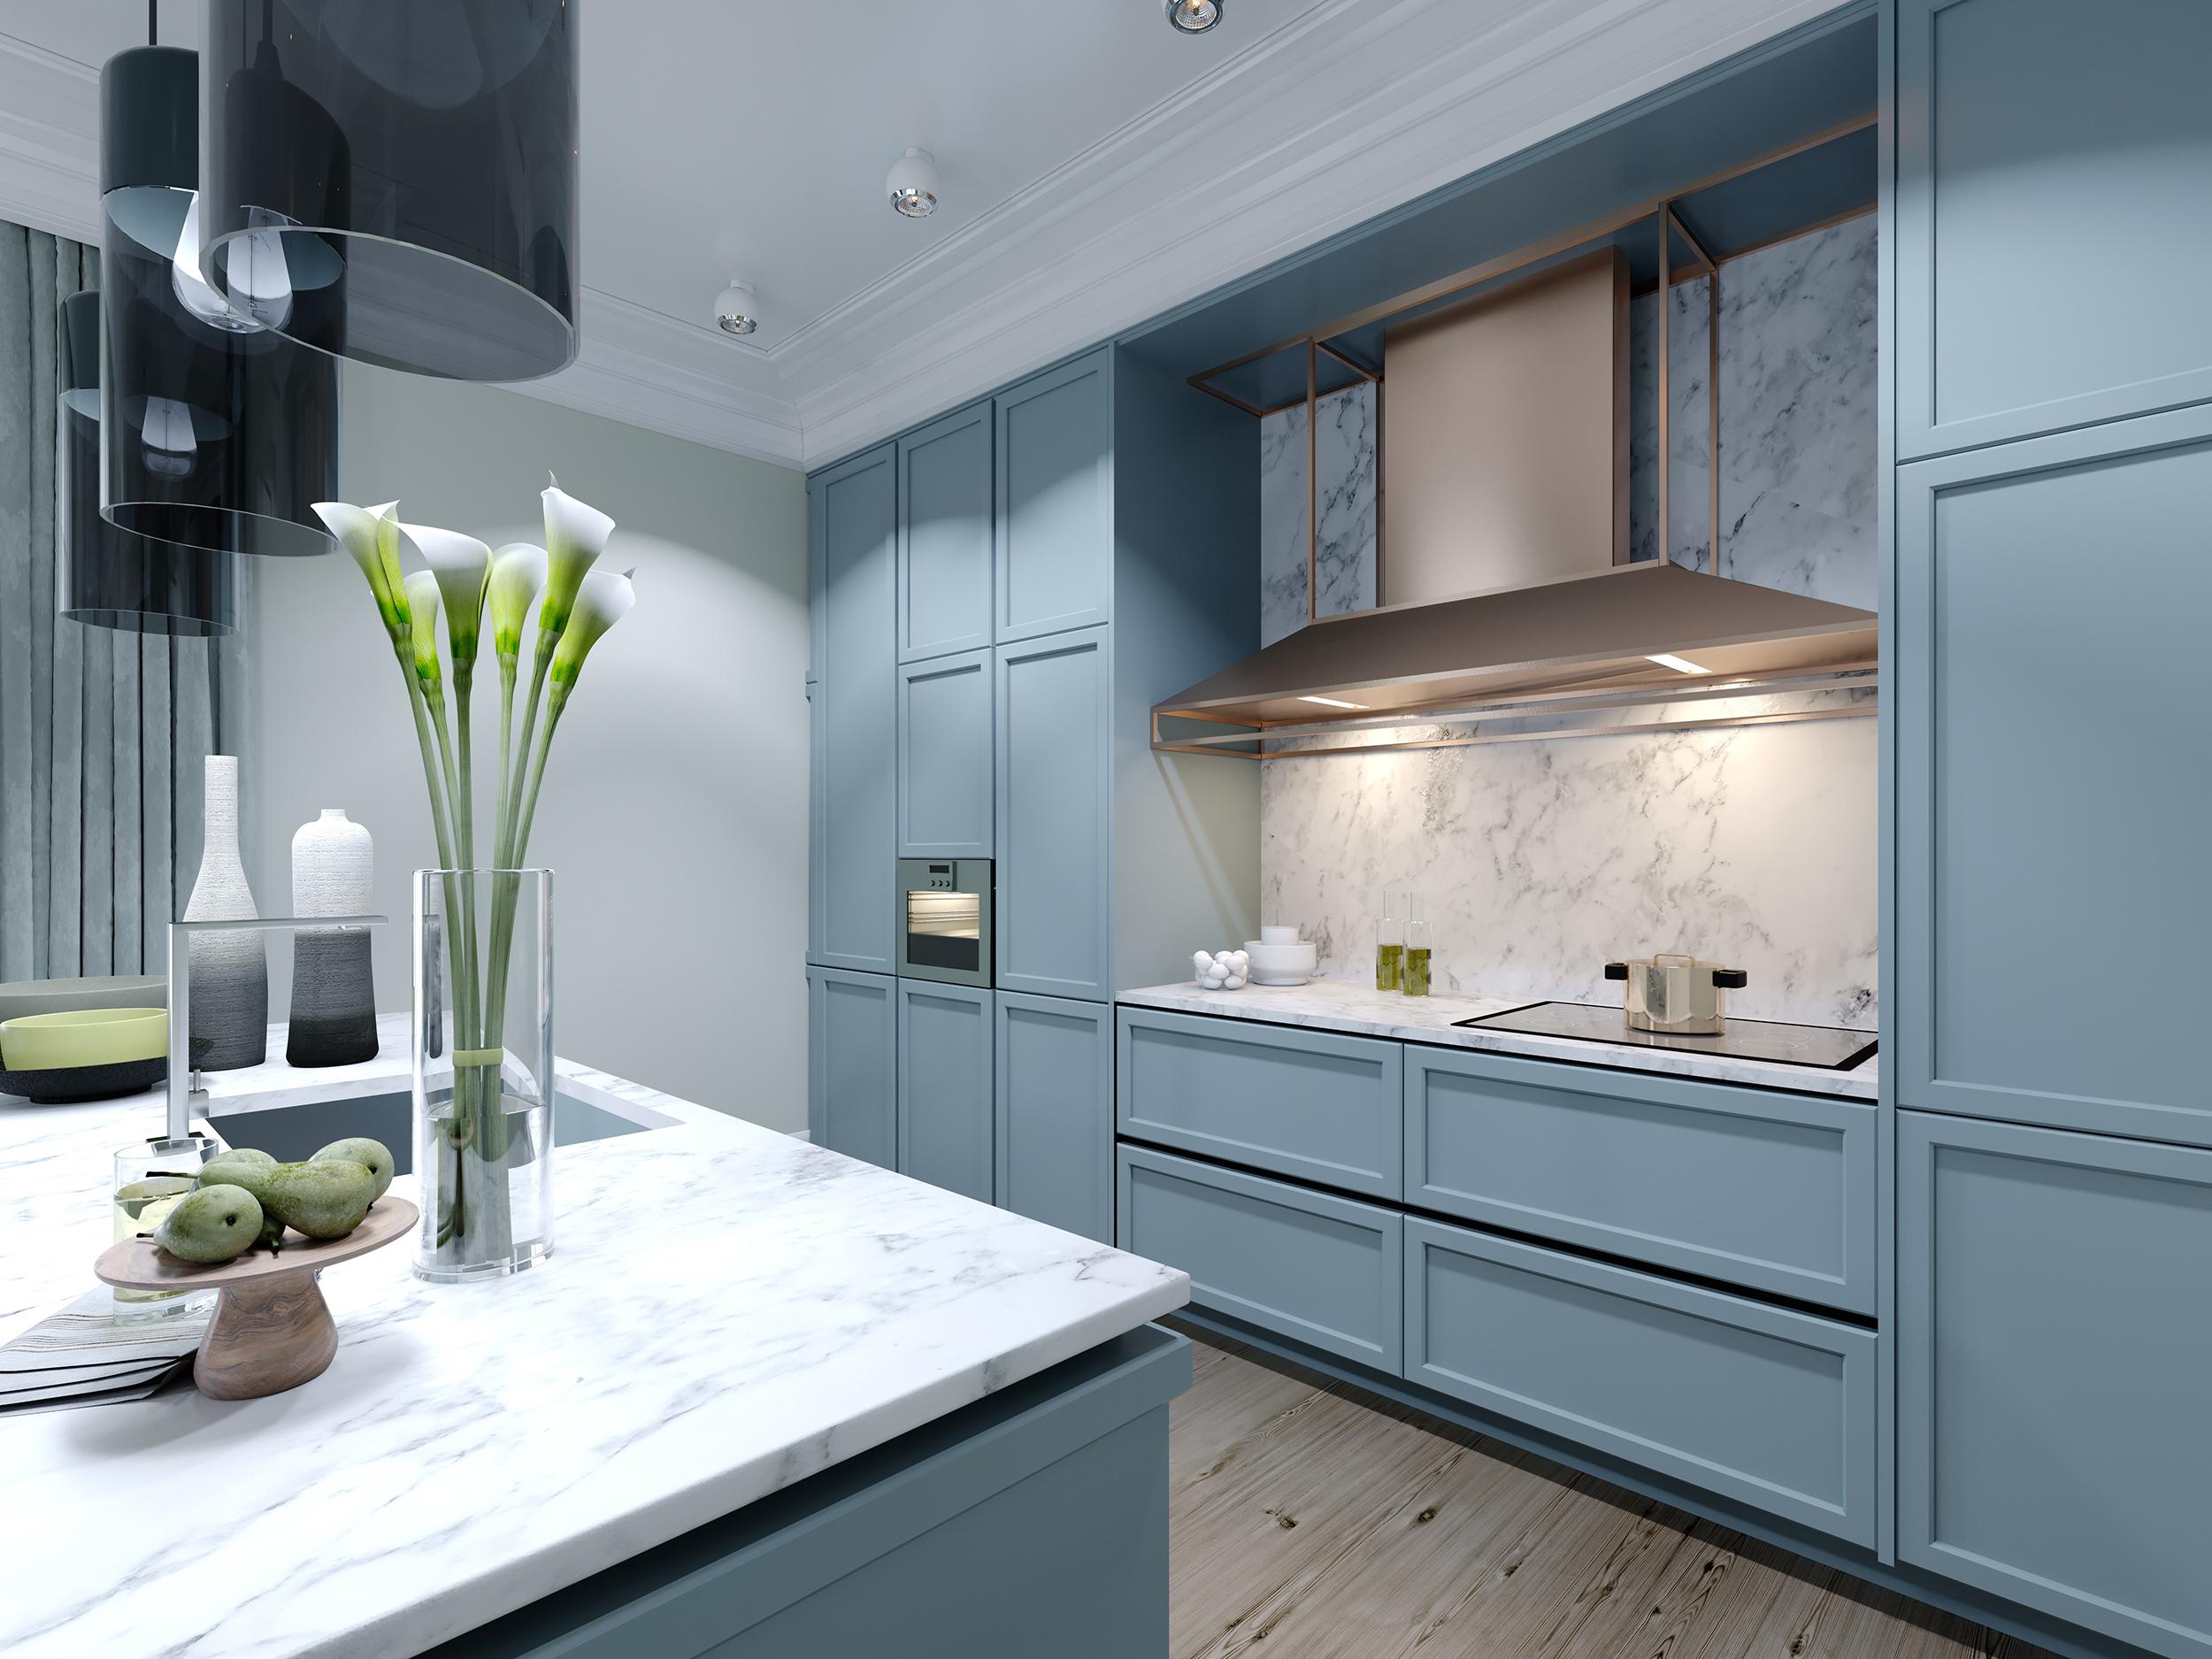 Inspiring Kitchen Design Styles for 2021 7